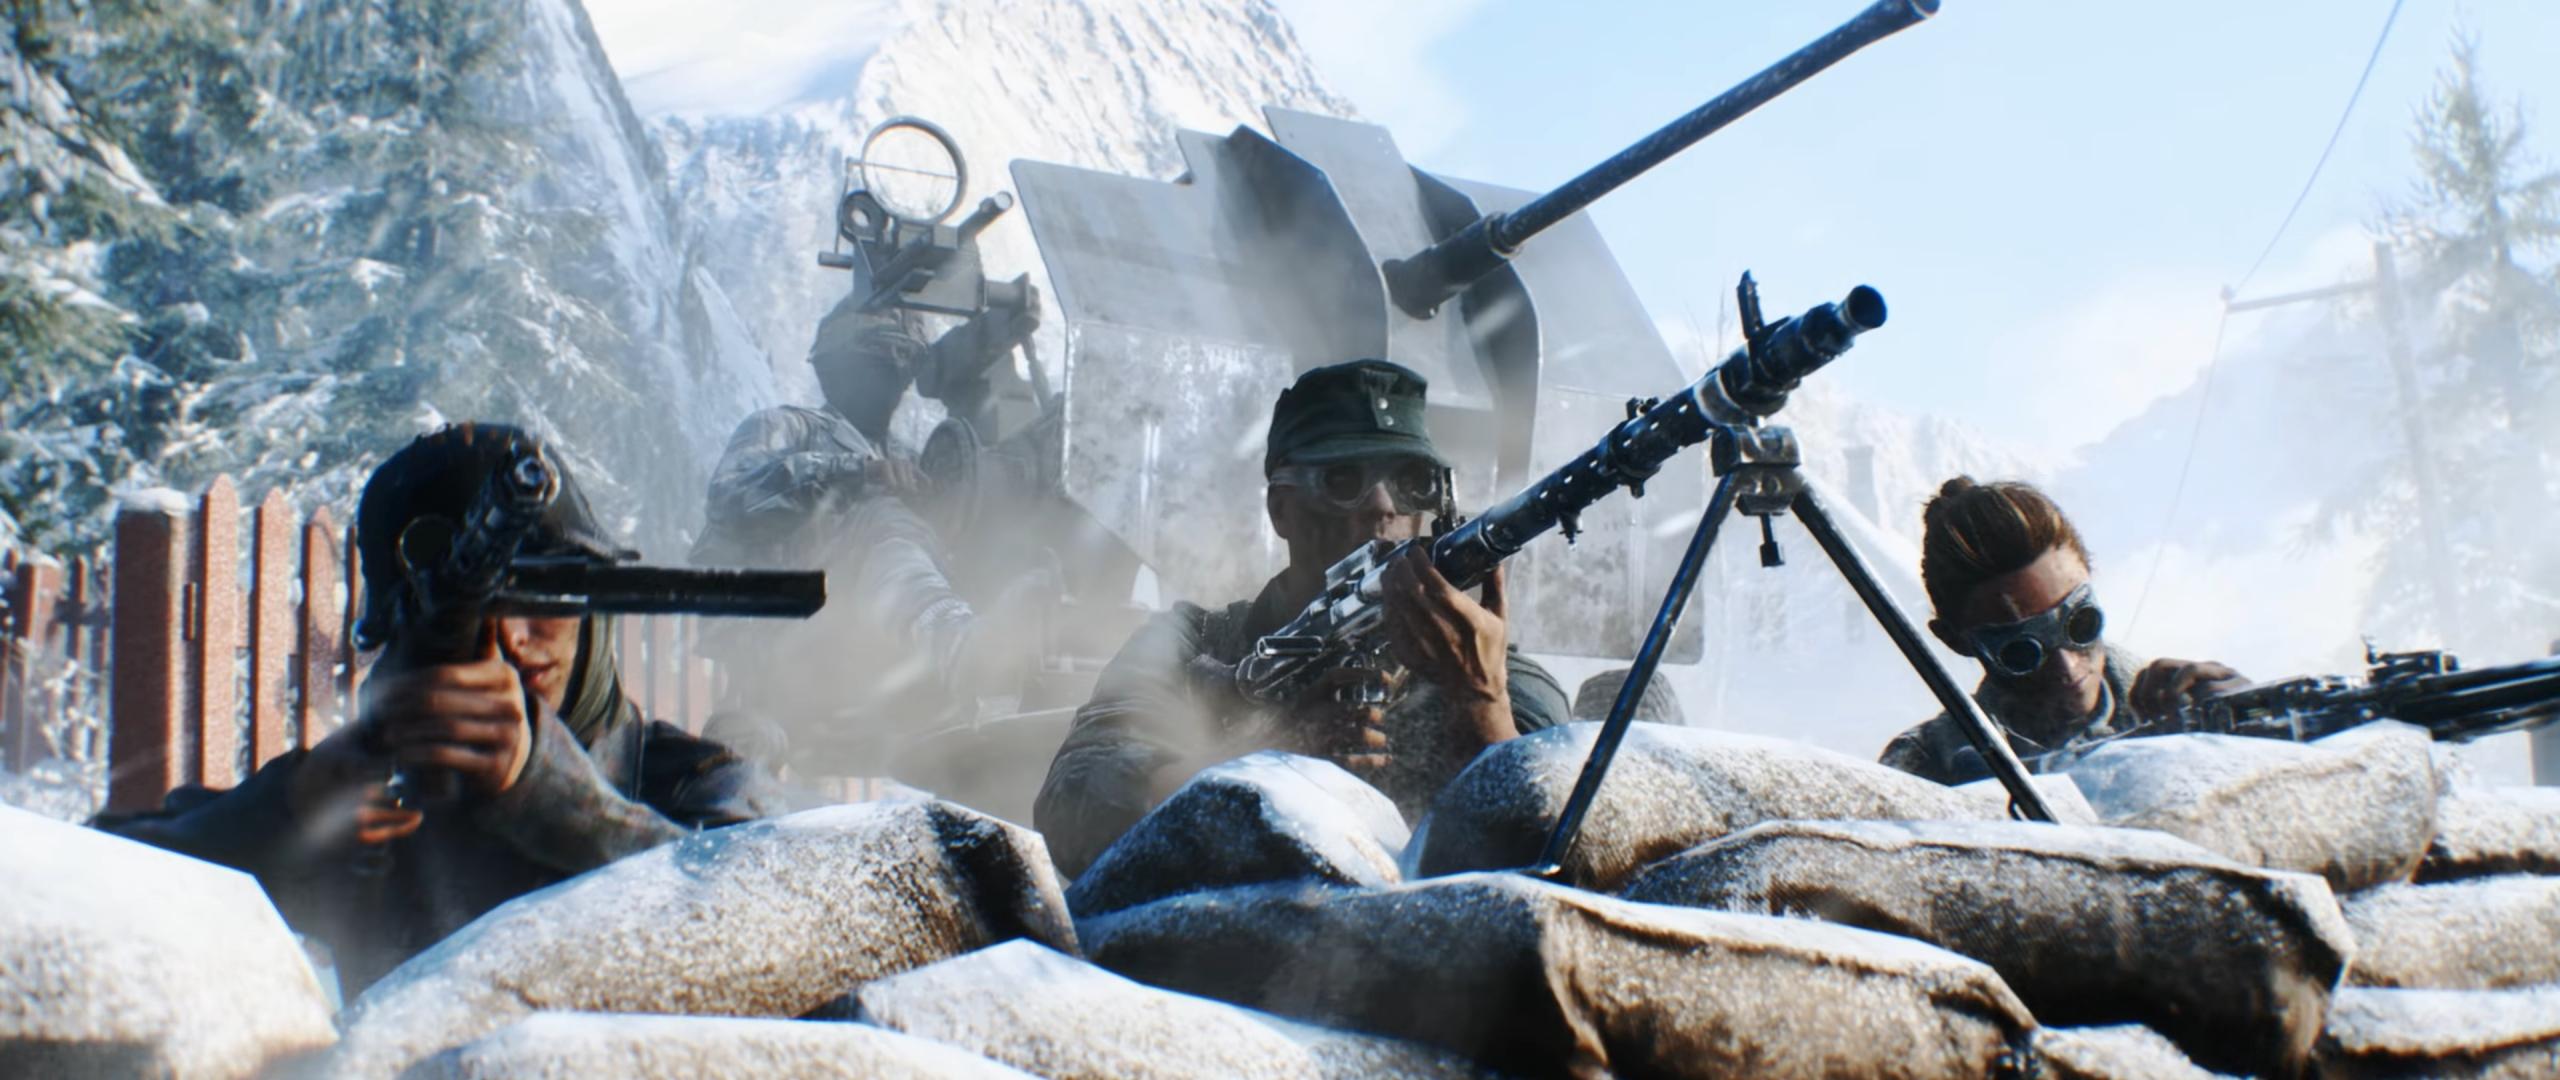 Download 2560x1080 Wallpaper Battlefield 5 Soldiers 2018